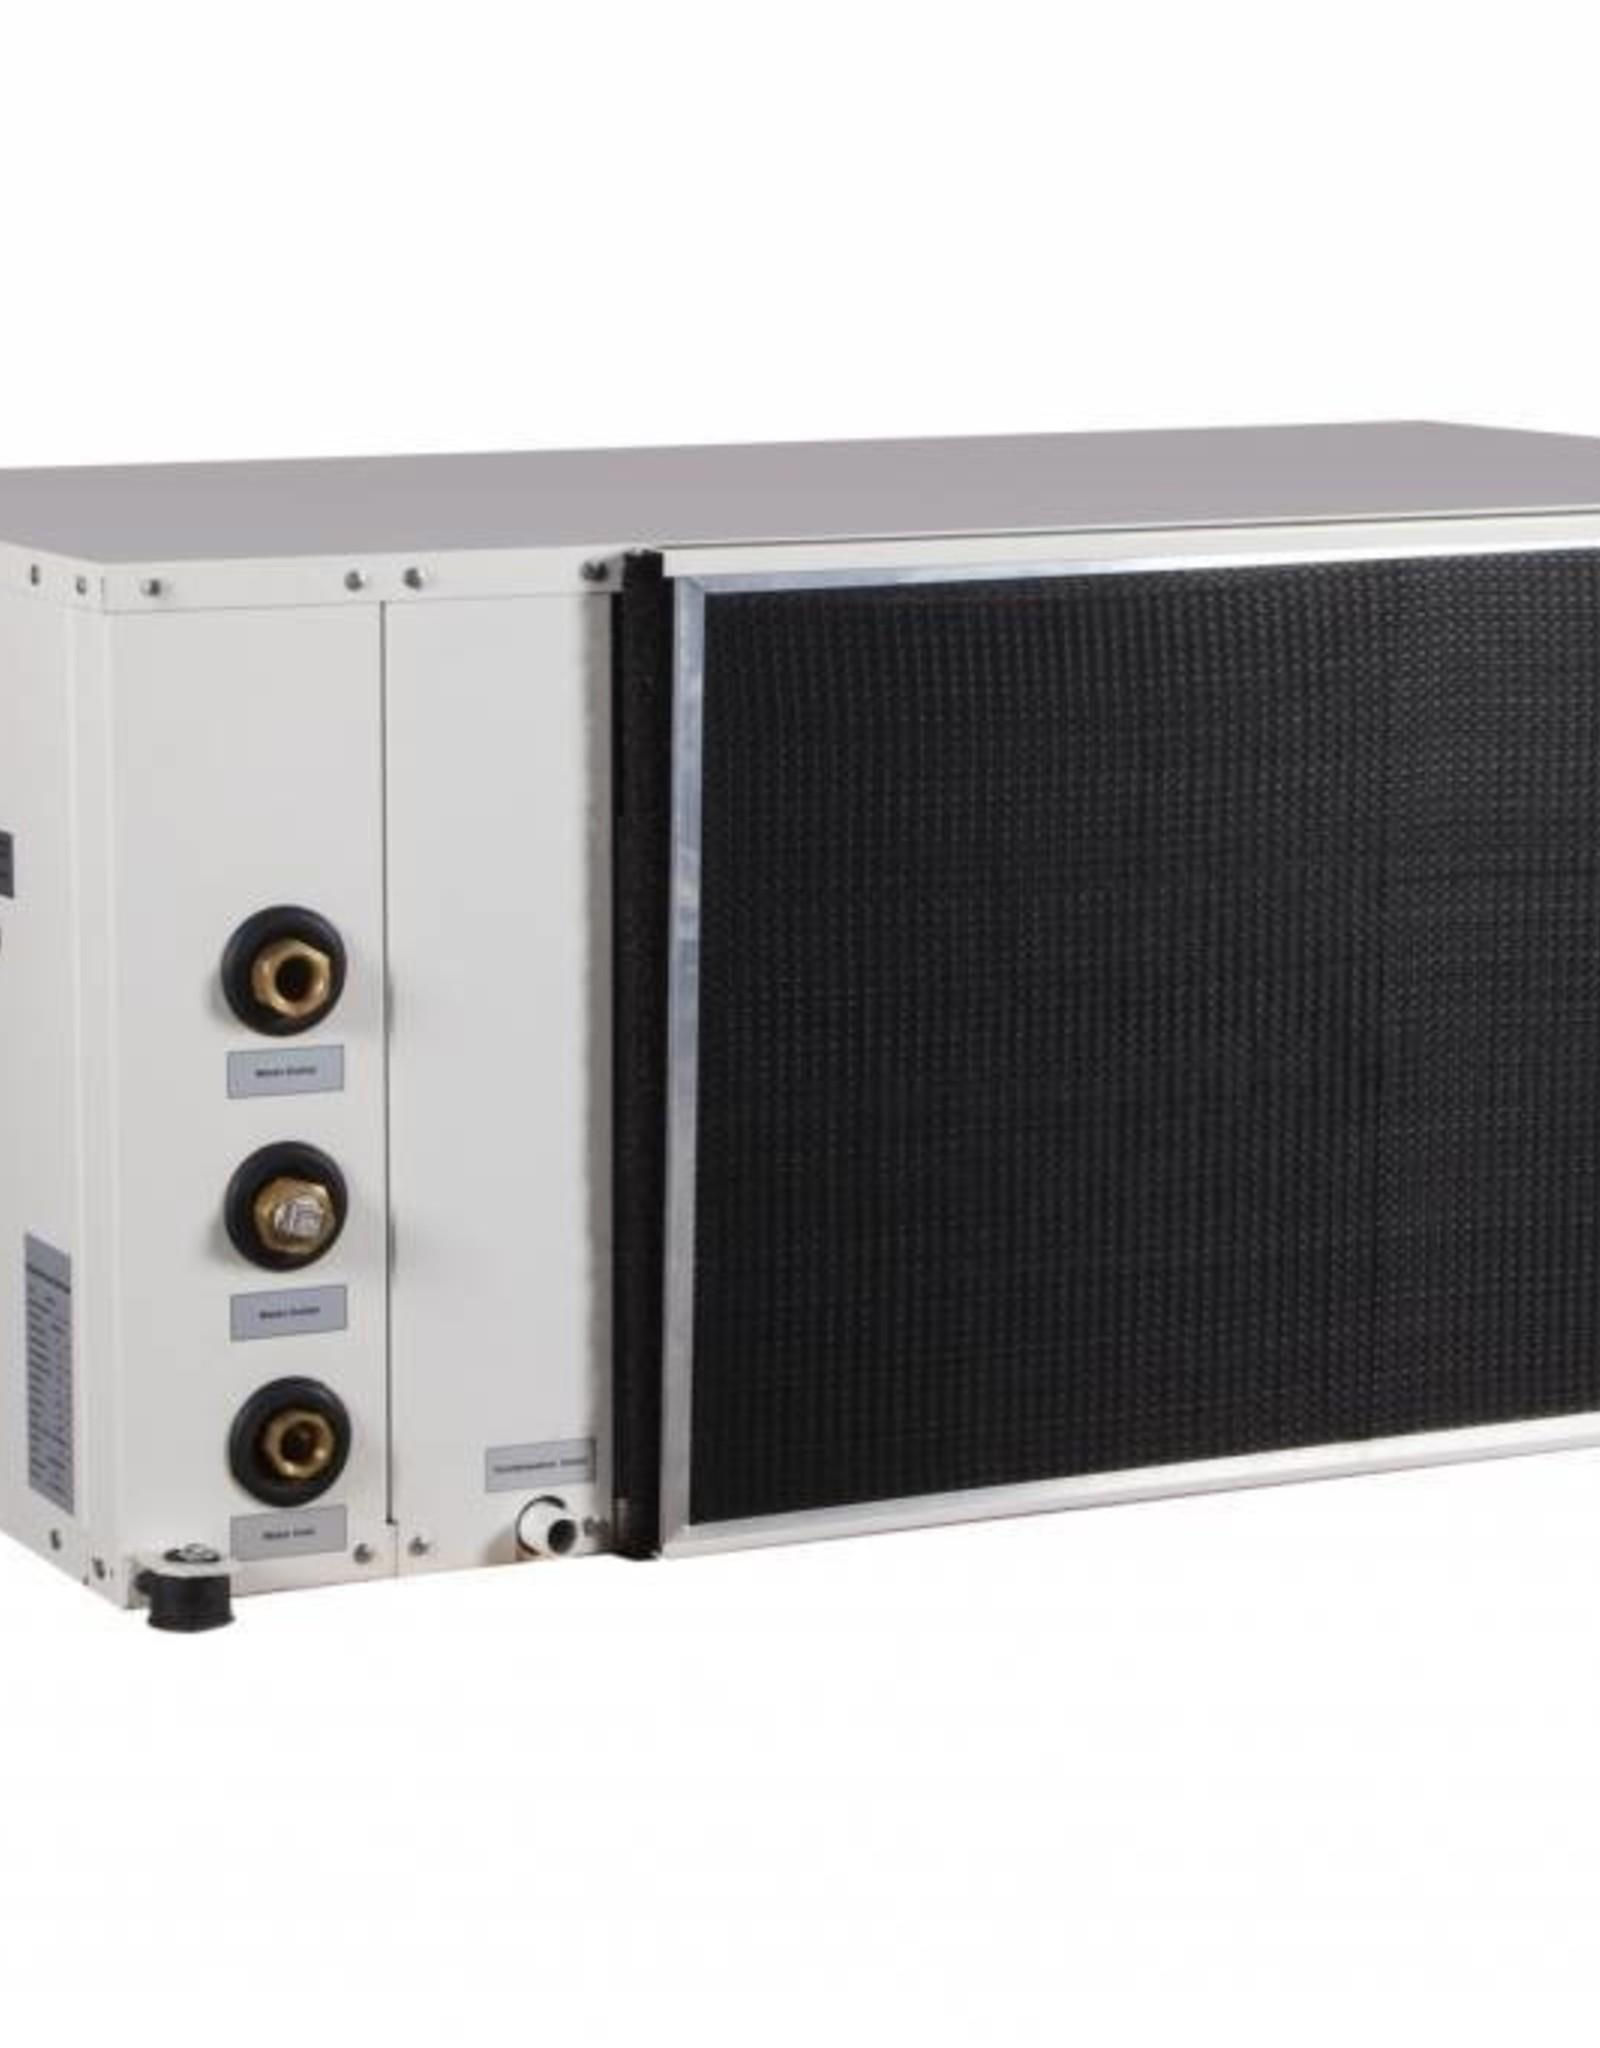 OptiClimate 15000 PRO4 Inverter